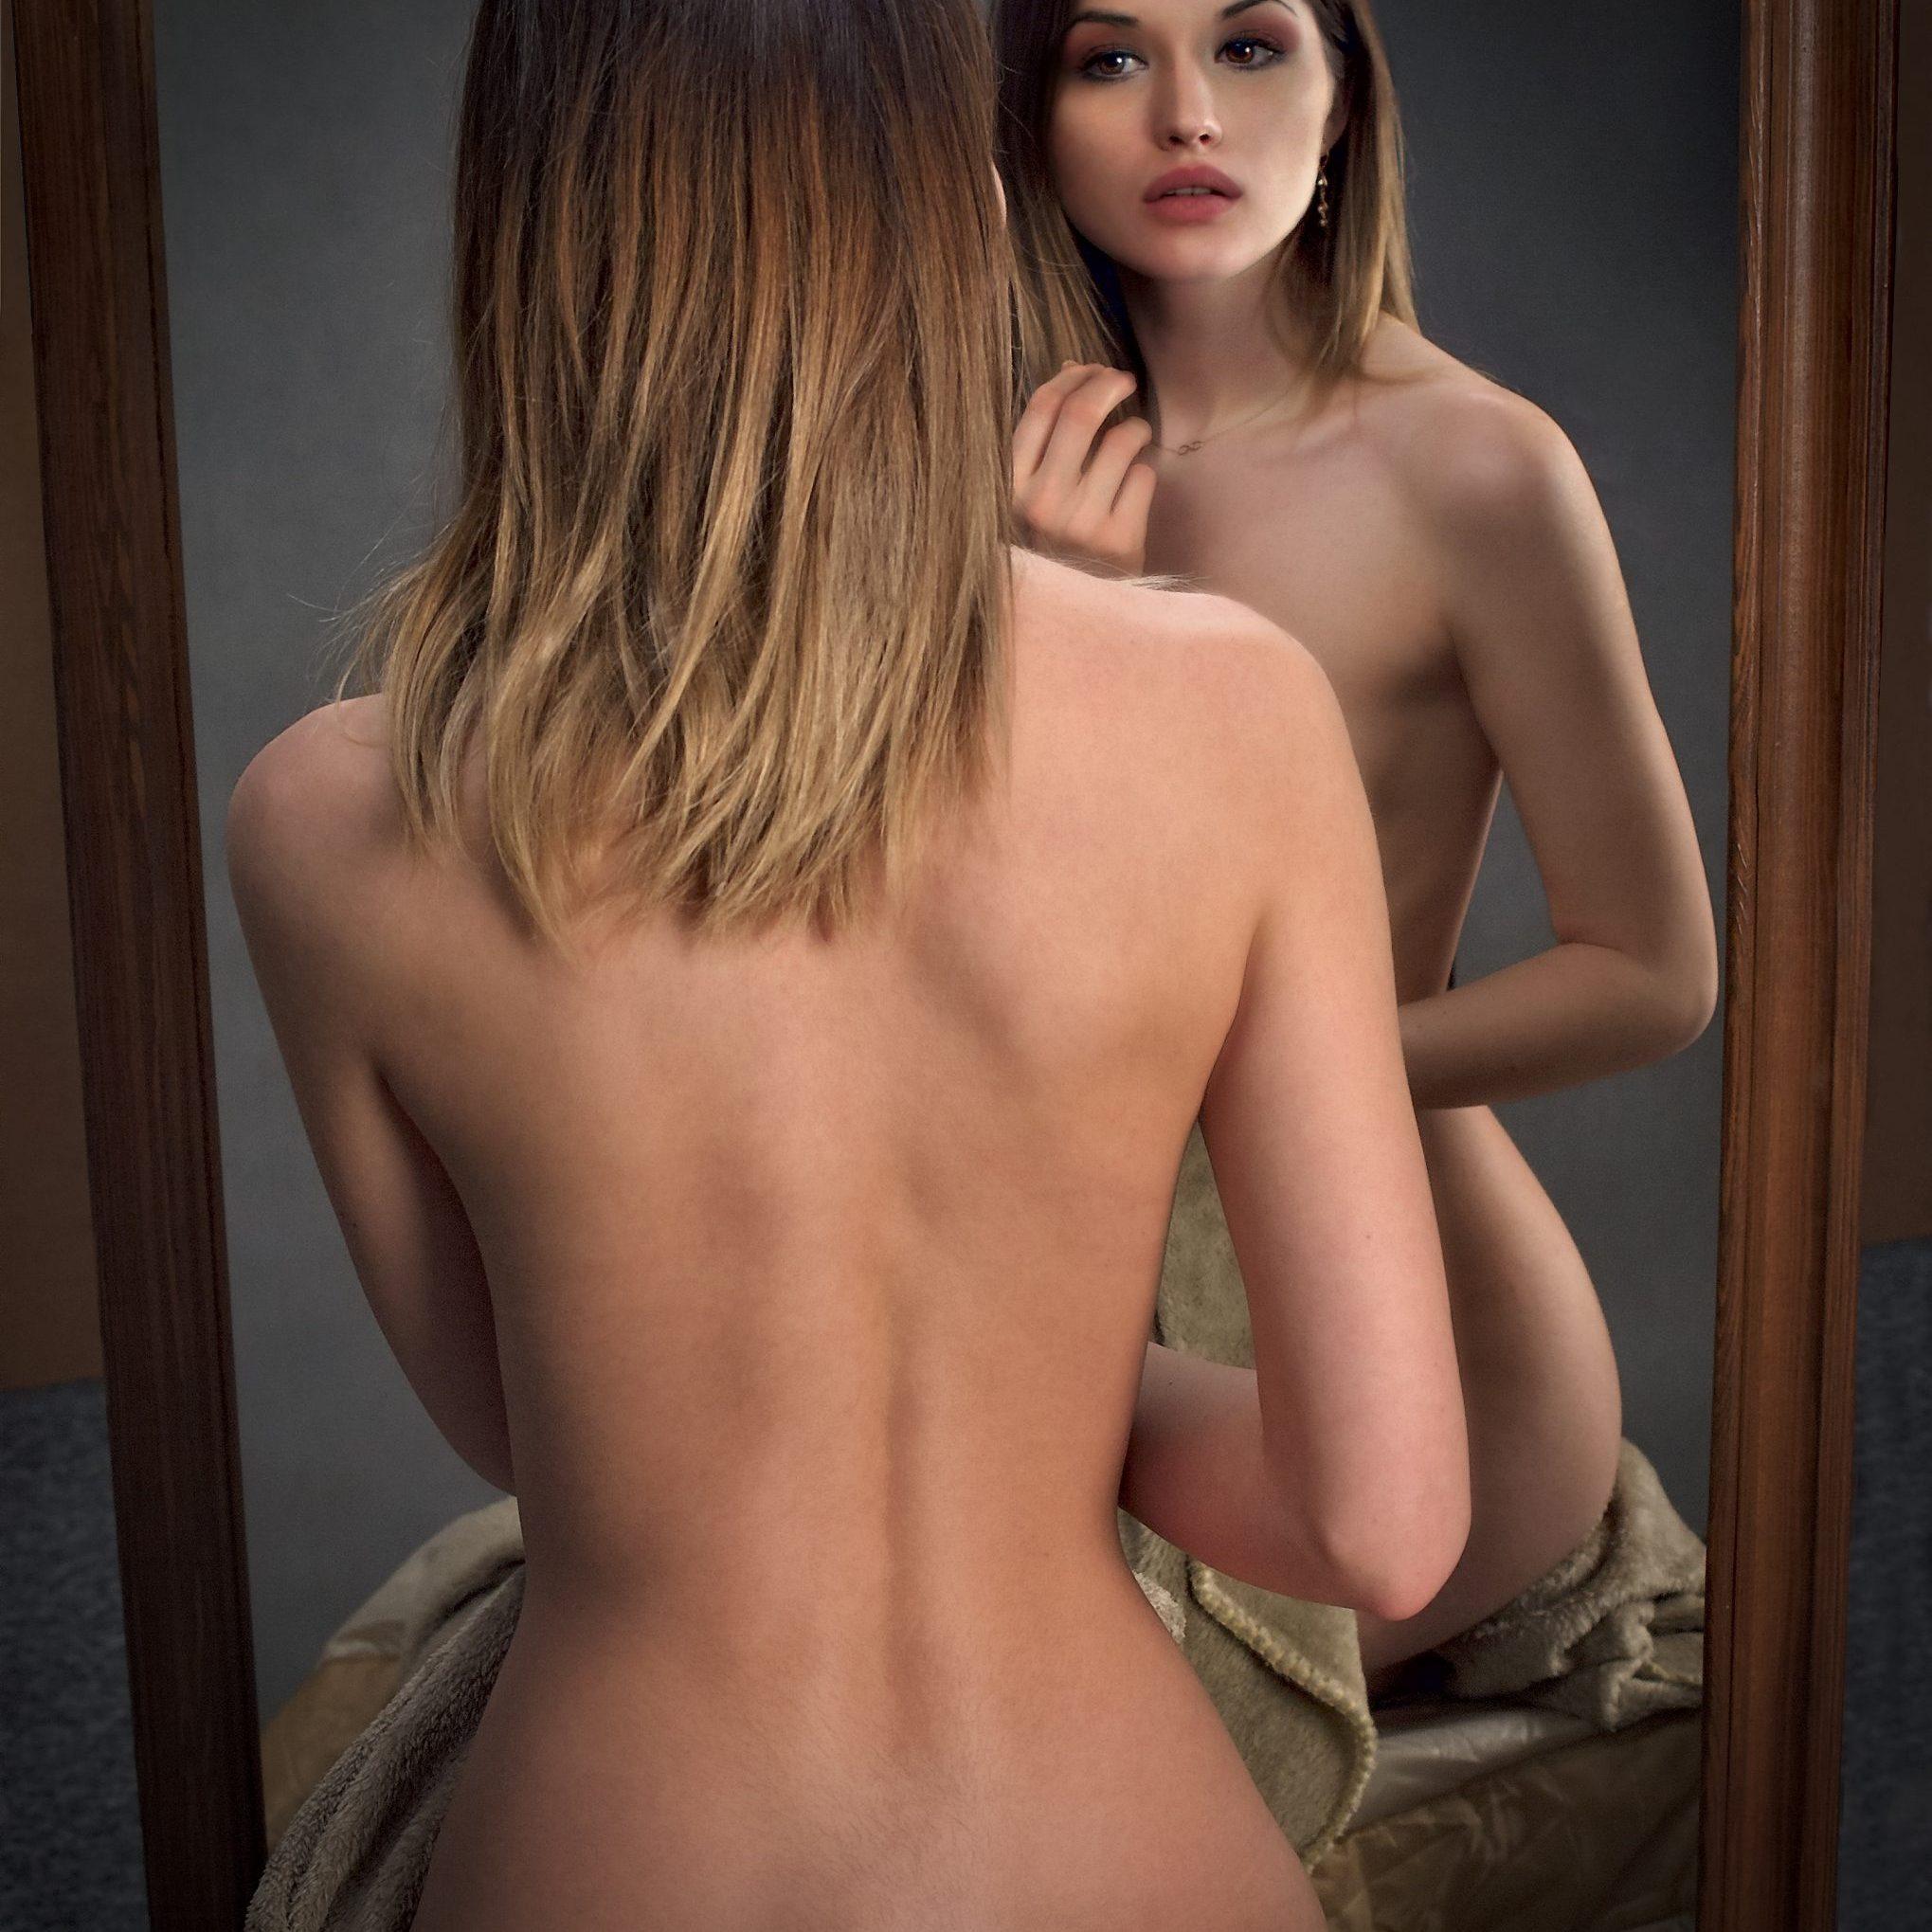 mirror-3810338